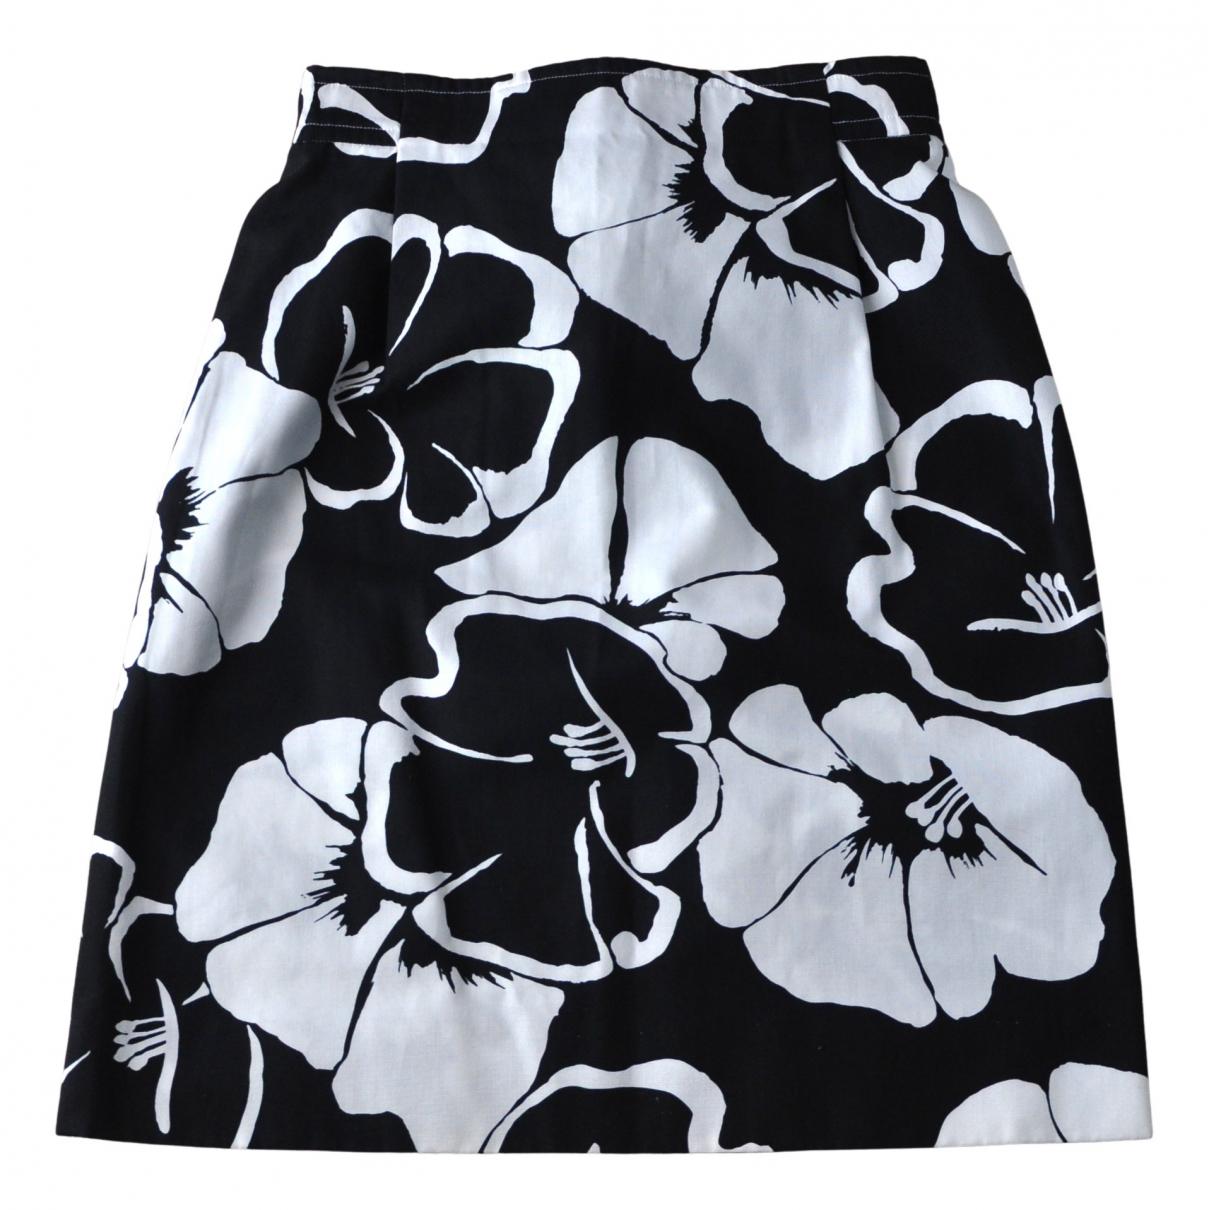 Courrèges \N Cotton skirt for Women 38 FR